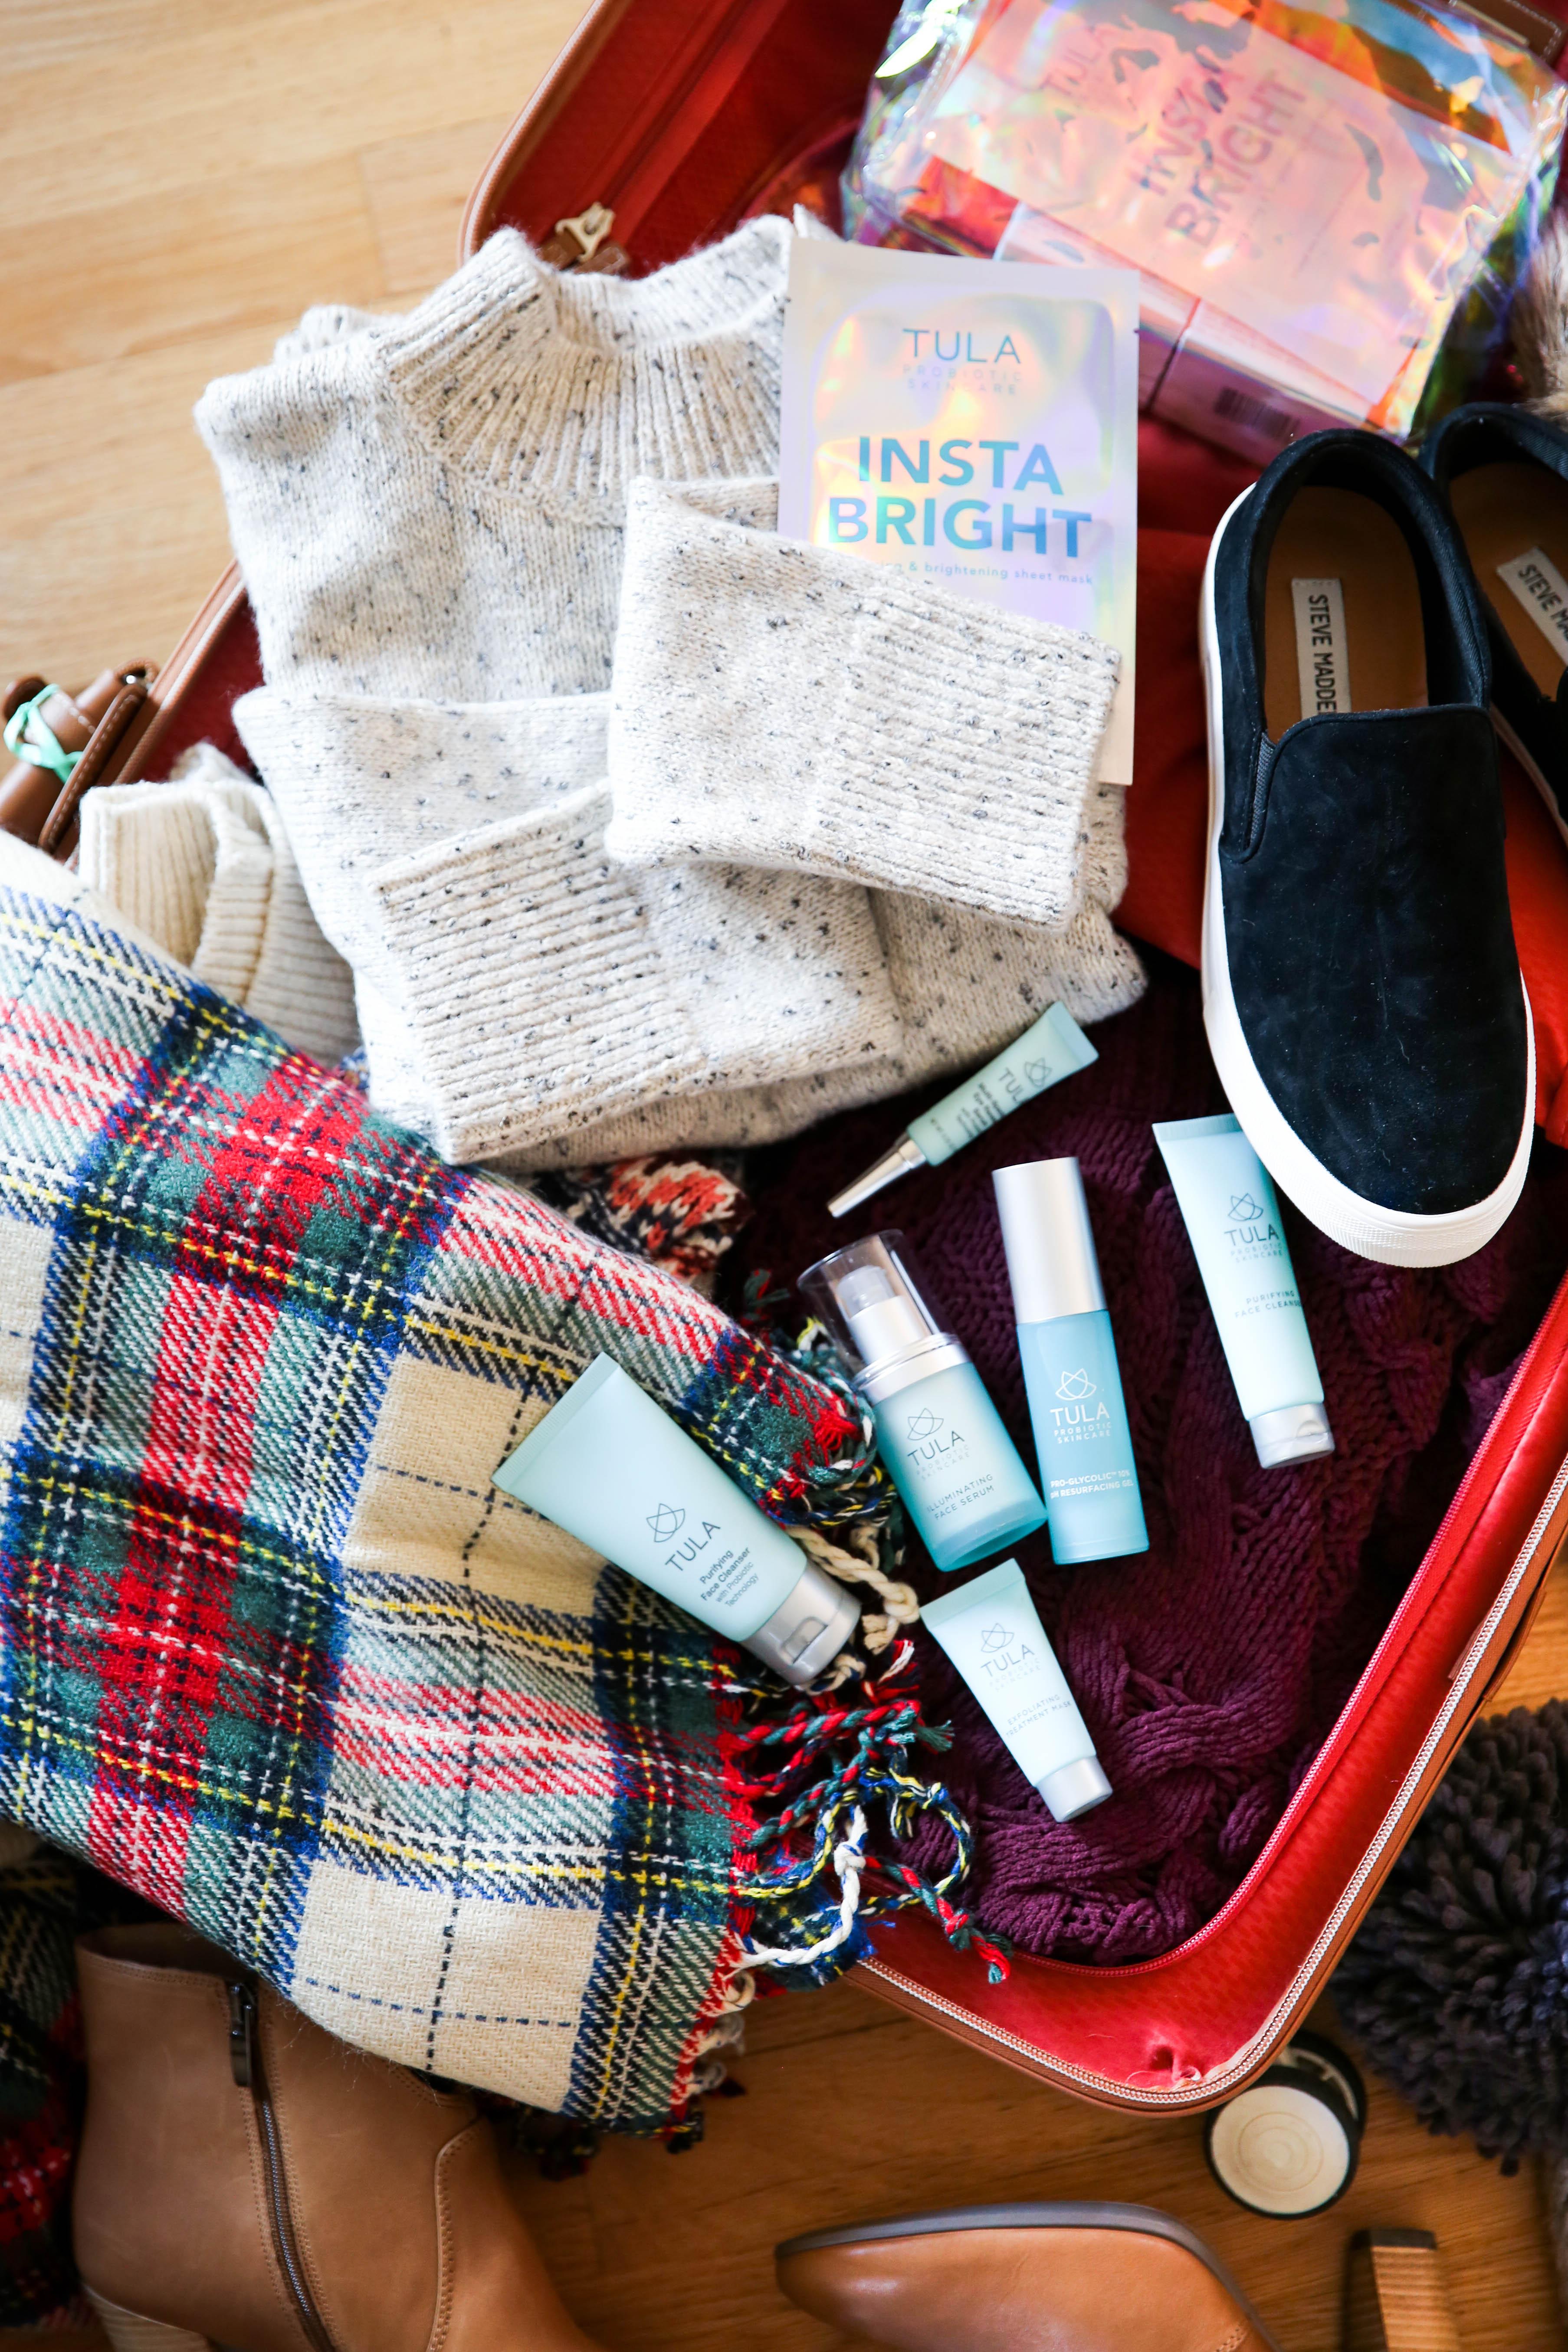 PaleOMG - Holiday Skincare Kits Perfect for Travel